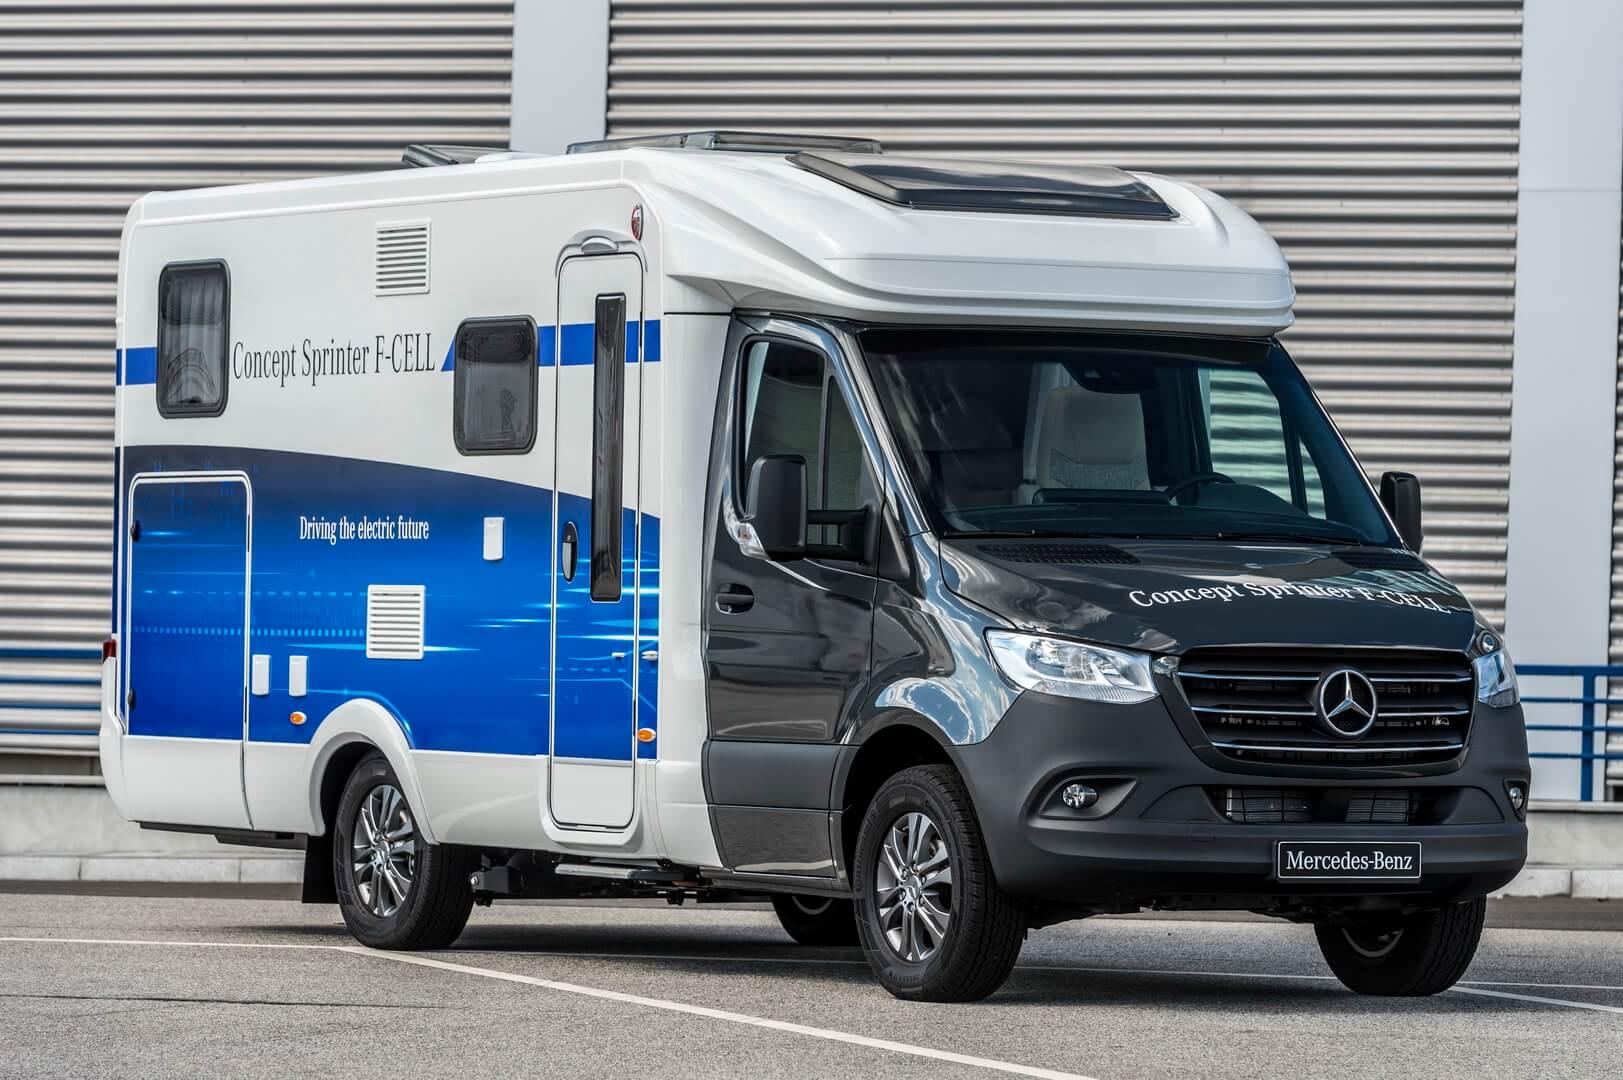 Концепт водородного фургона Mercedes-Benz Sprinter F-Cell